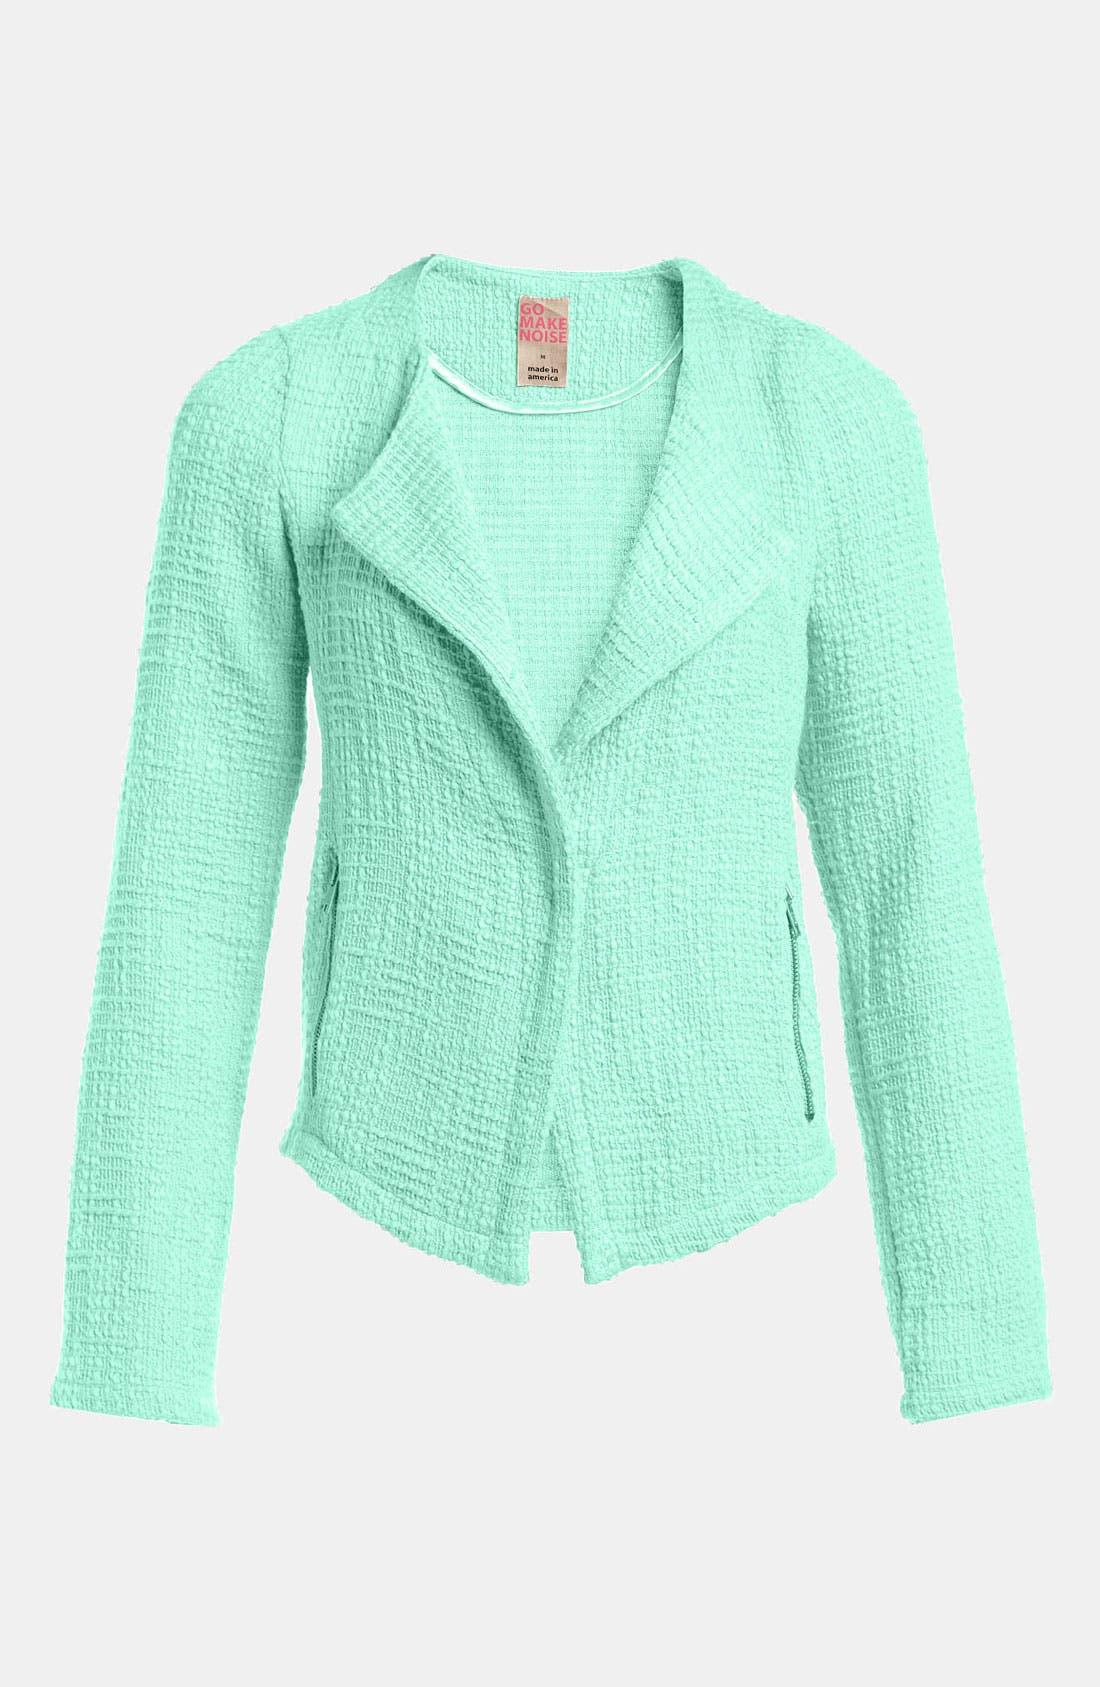 Alternate Image 1 Selected - Go Make Noise Textured Drape Front Jacket